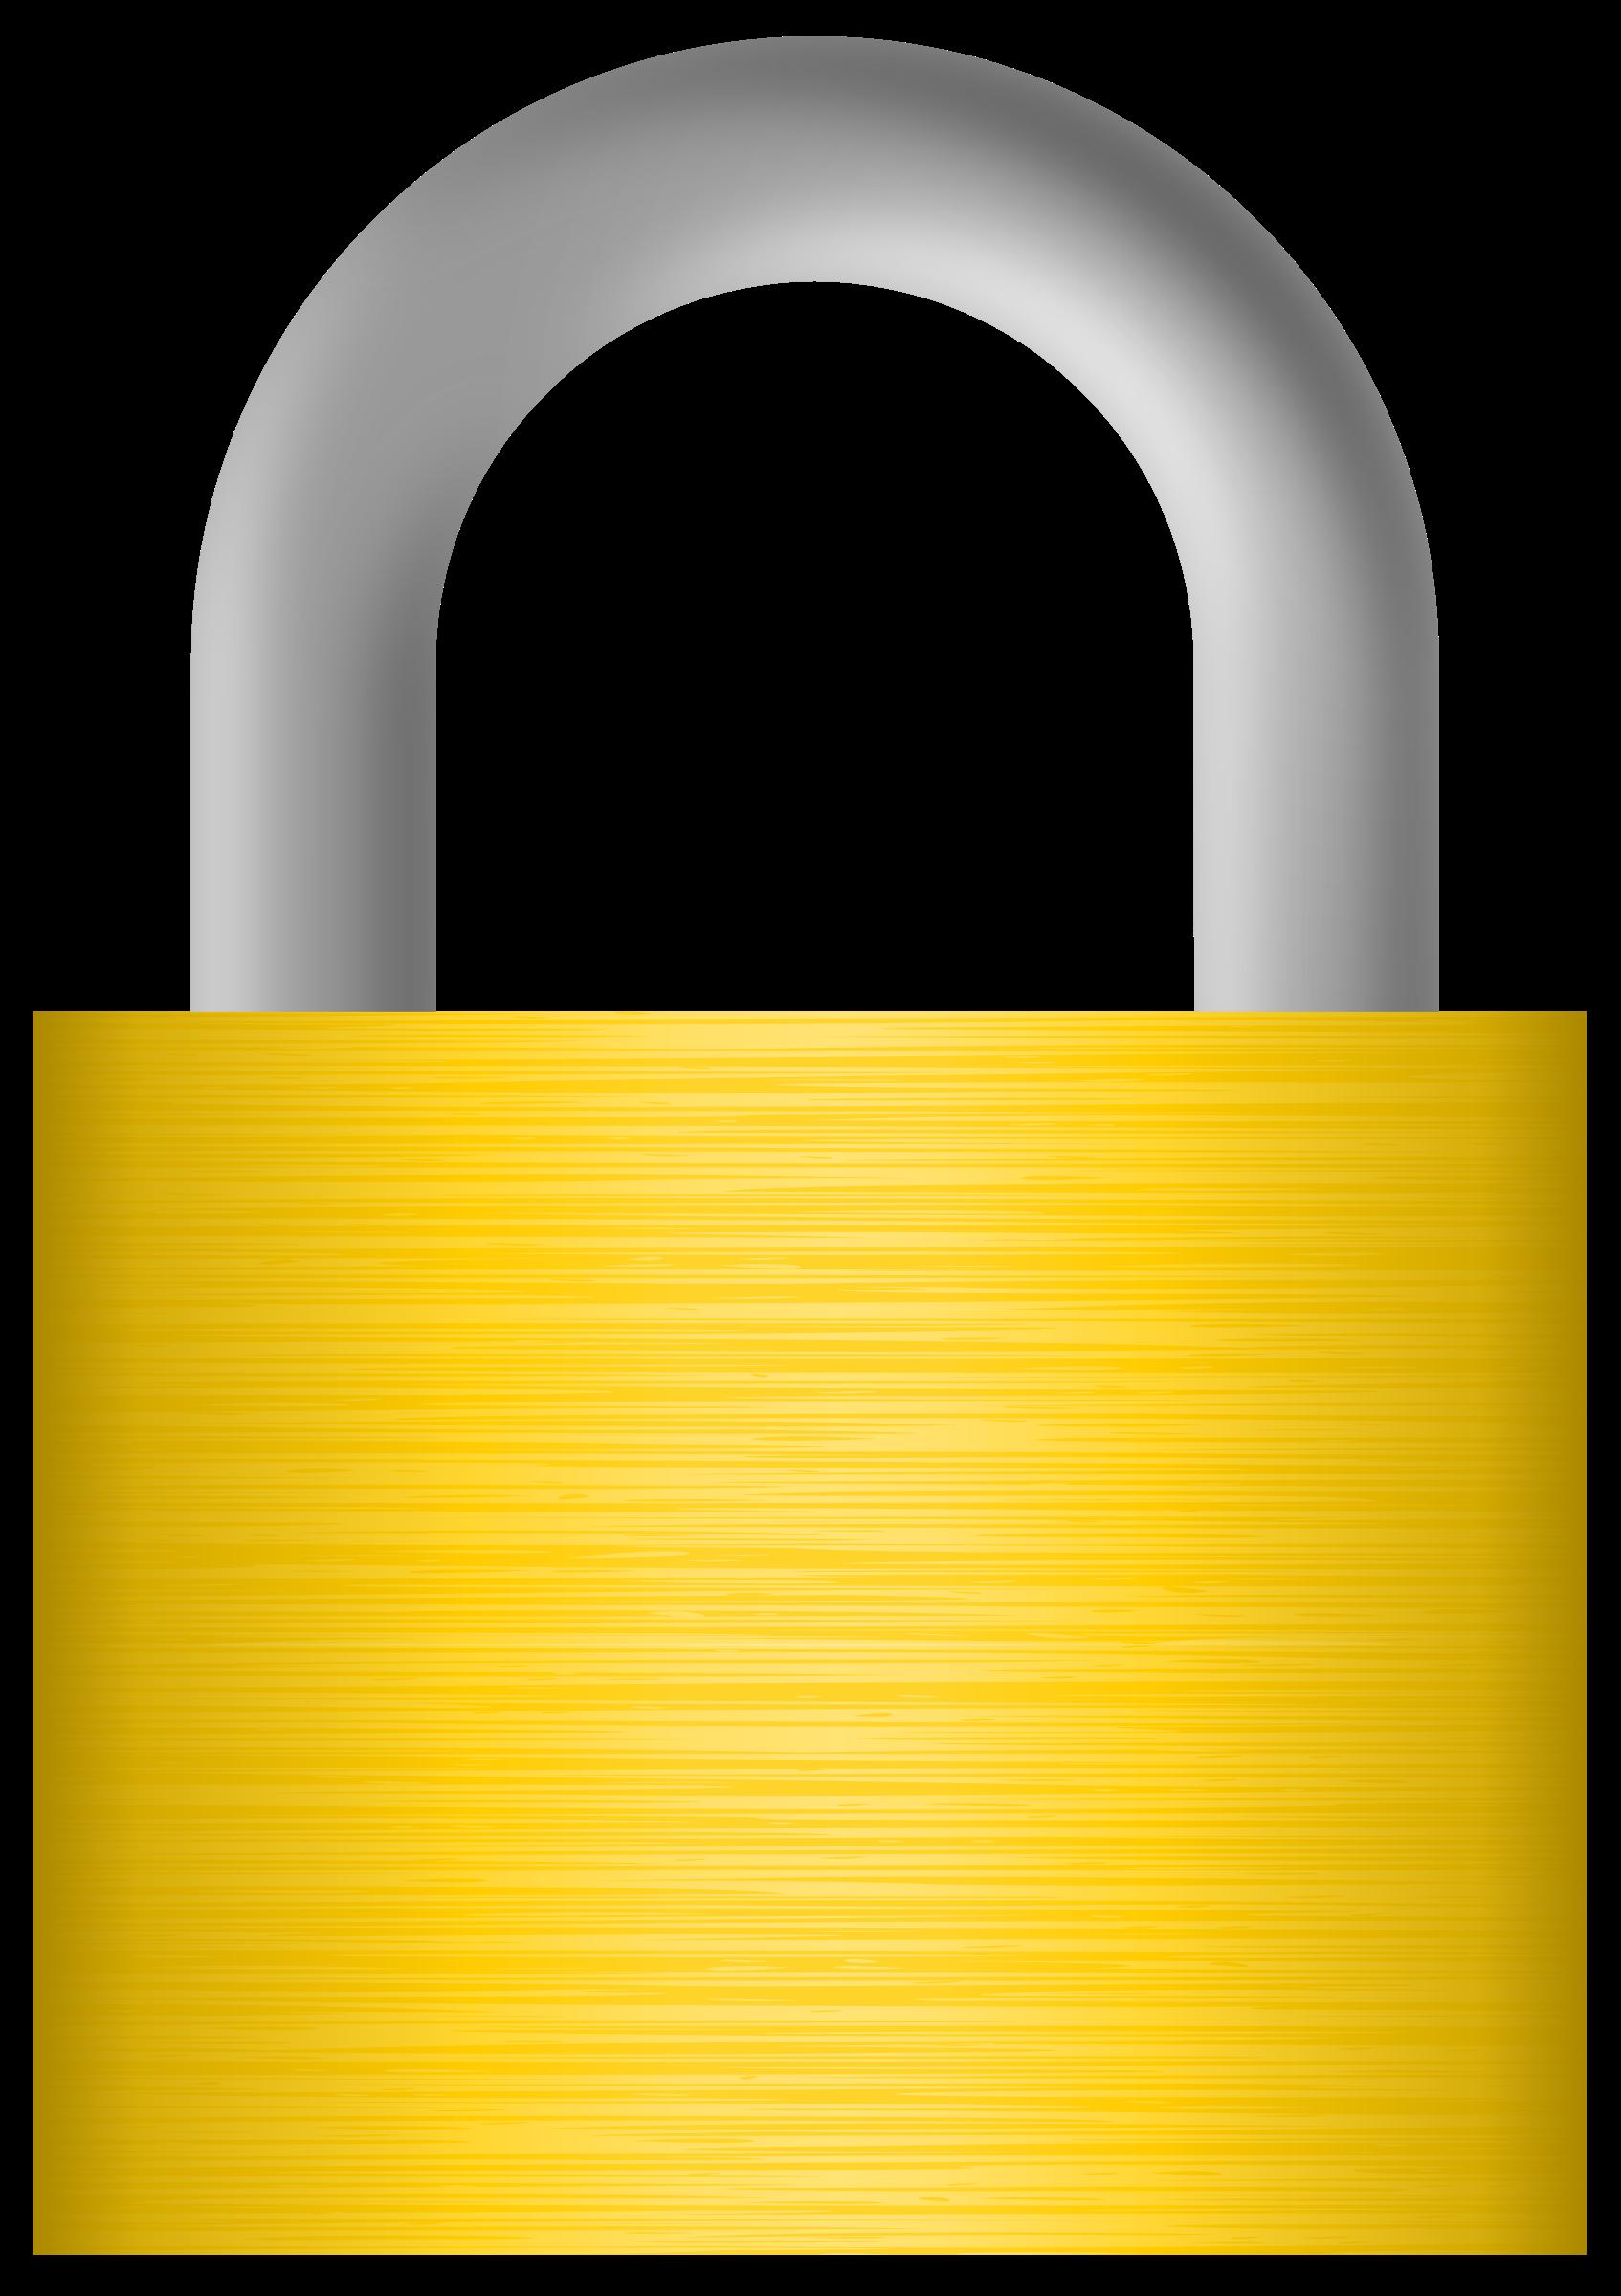 Lock clipart Lock Lock Clipart